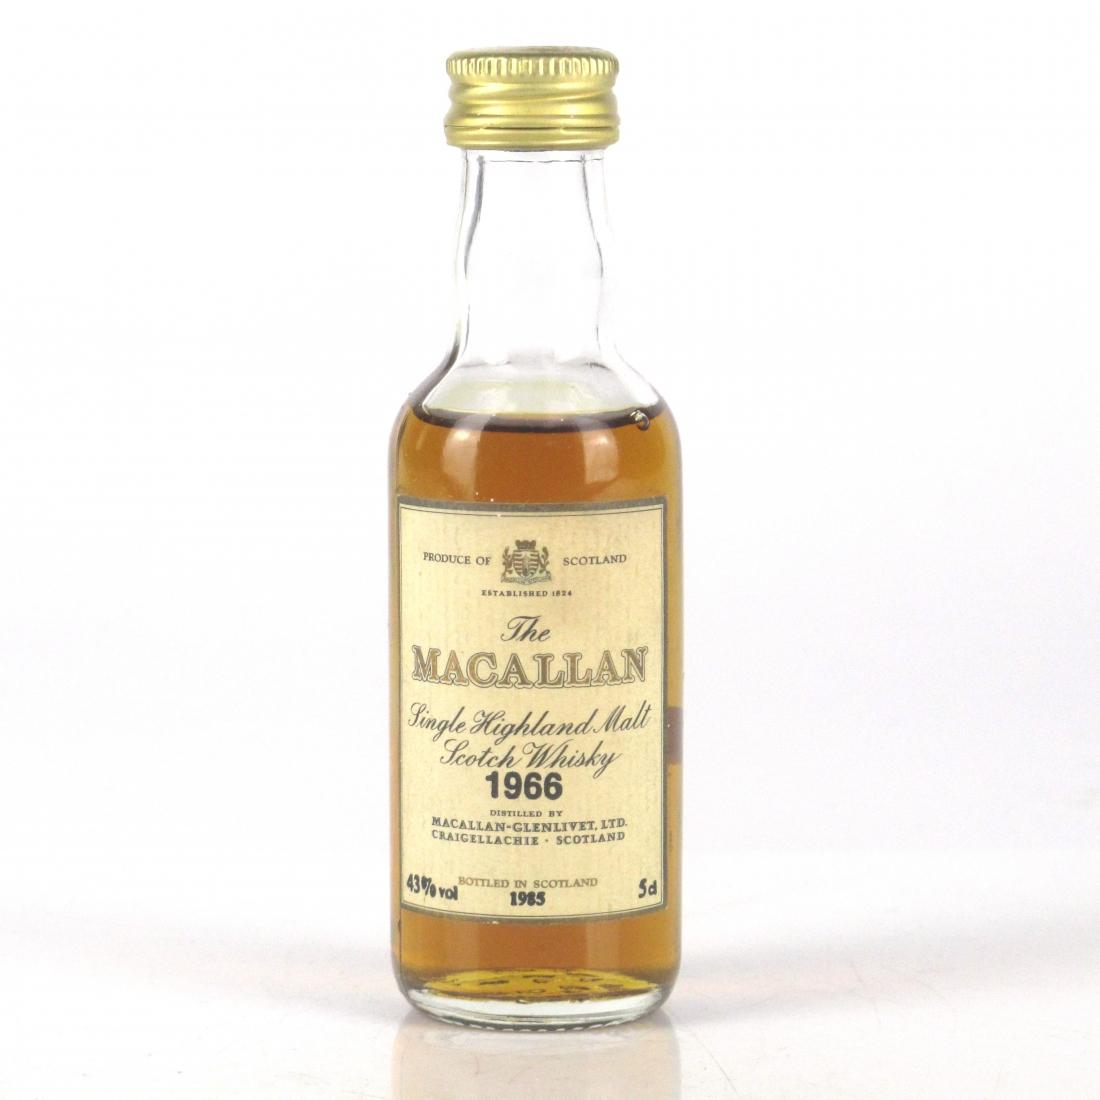 Macallan 18 Year Old 1966 Miniature 5cl